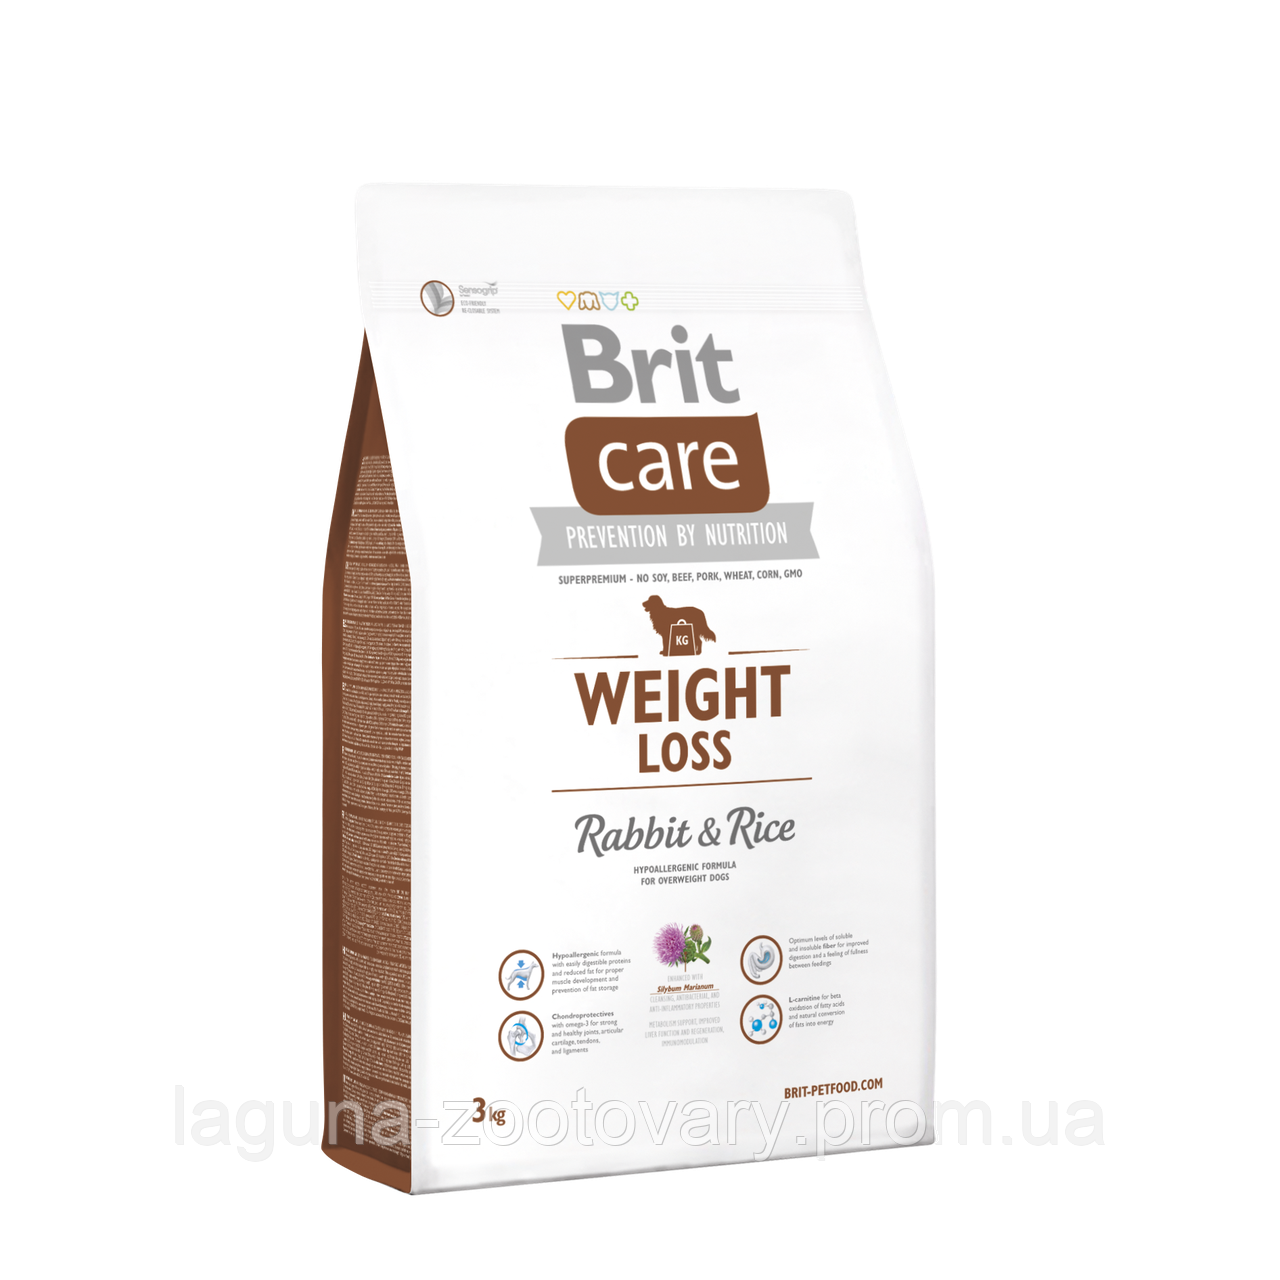 Brit Care Weight Loss Rabbit & Rice 3 kg (д/соб. с лишним весом)